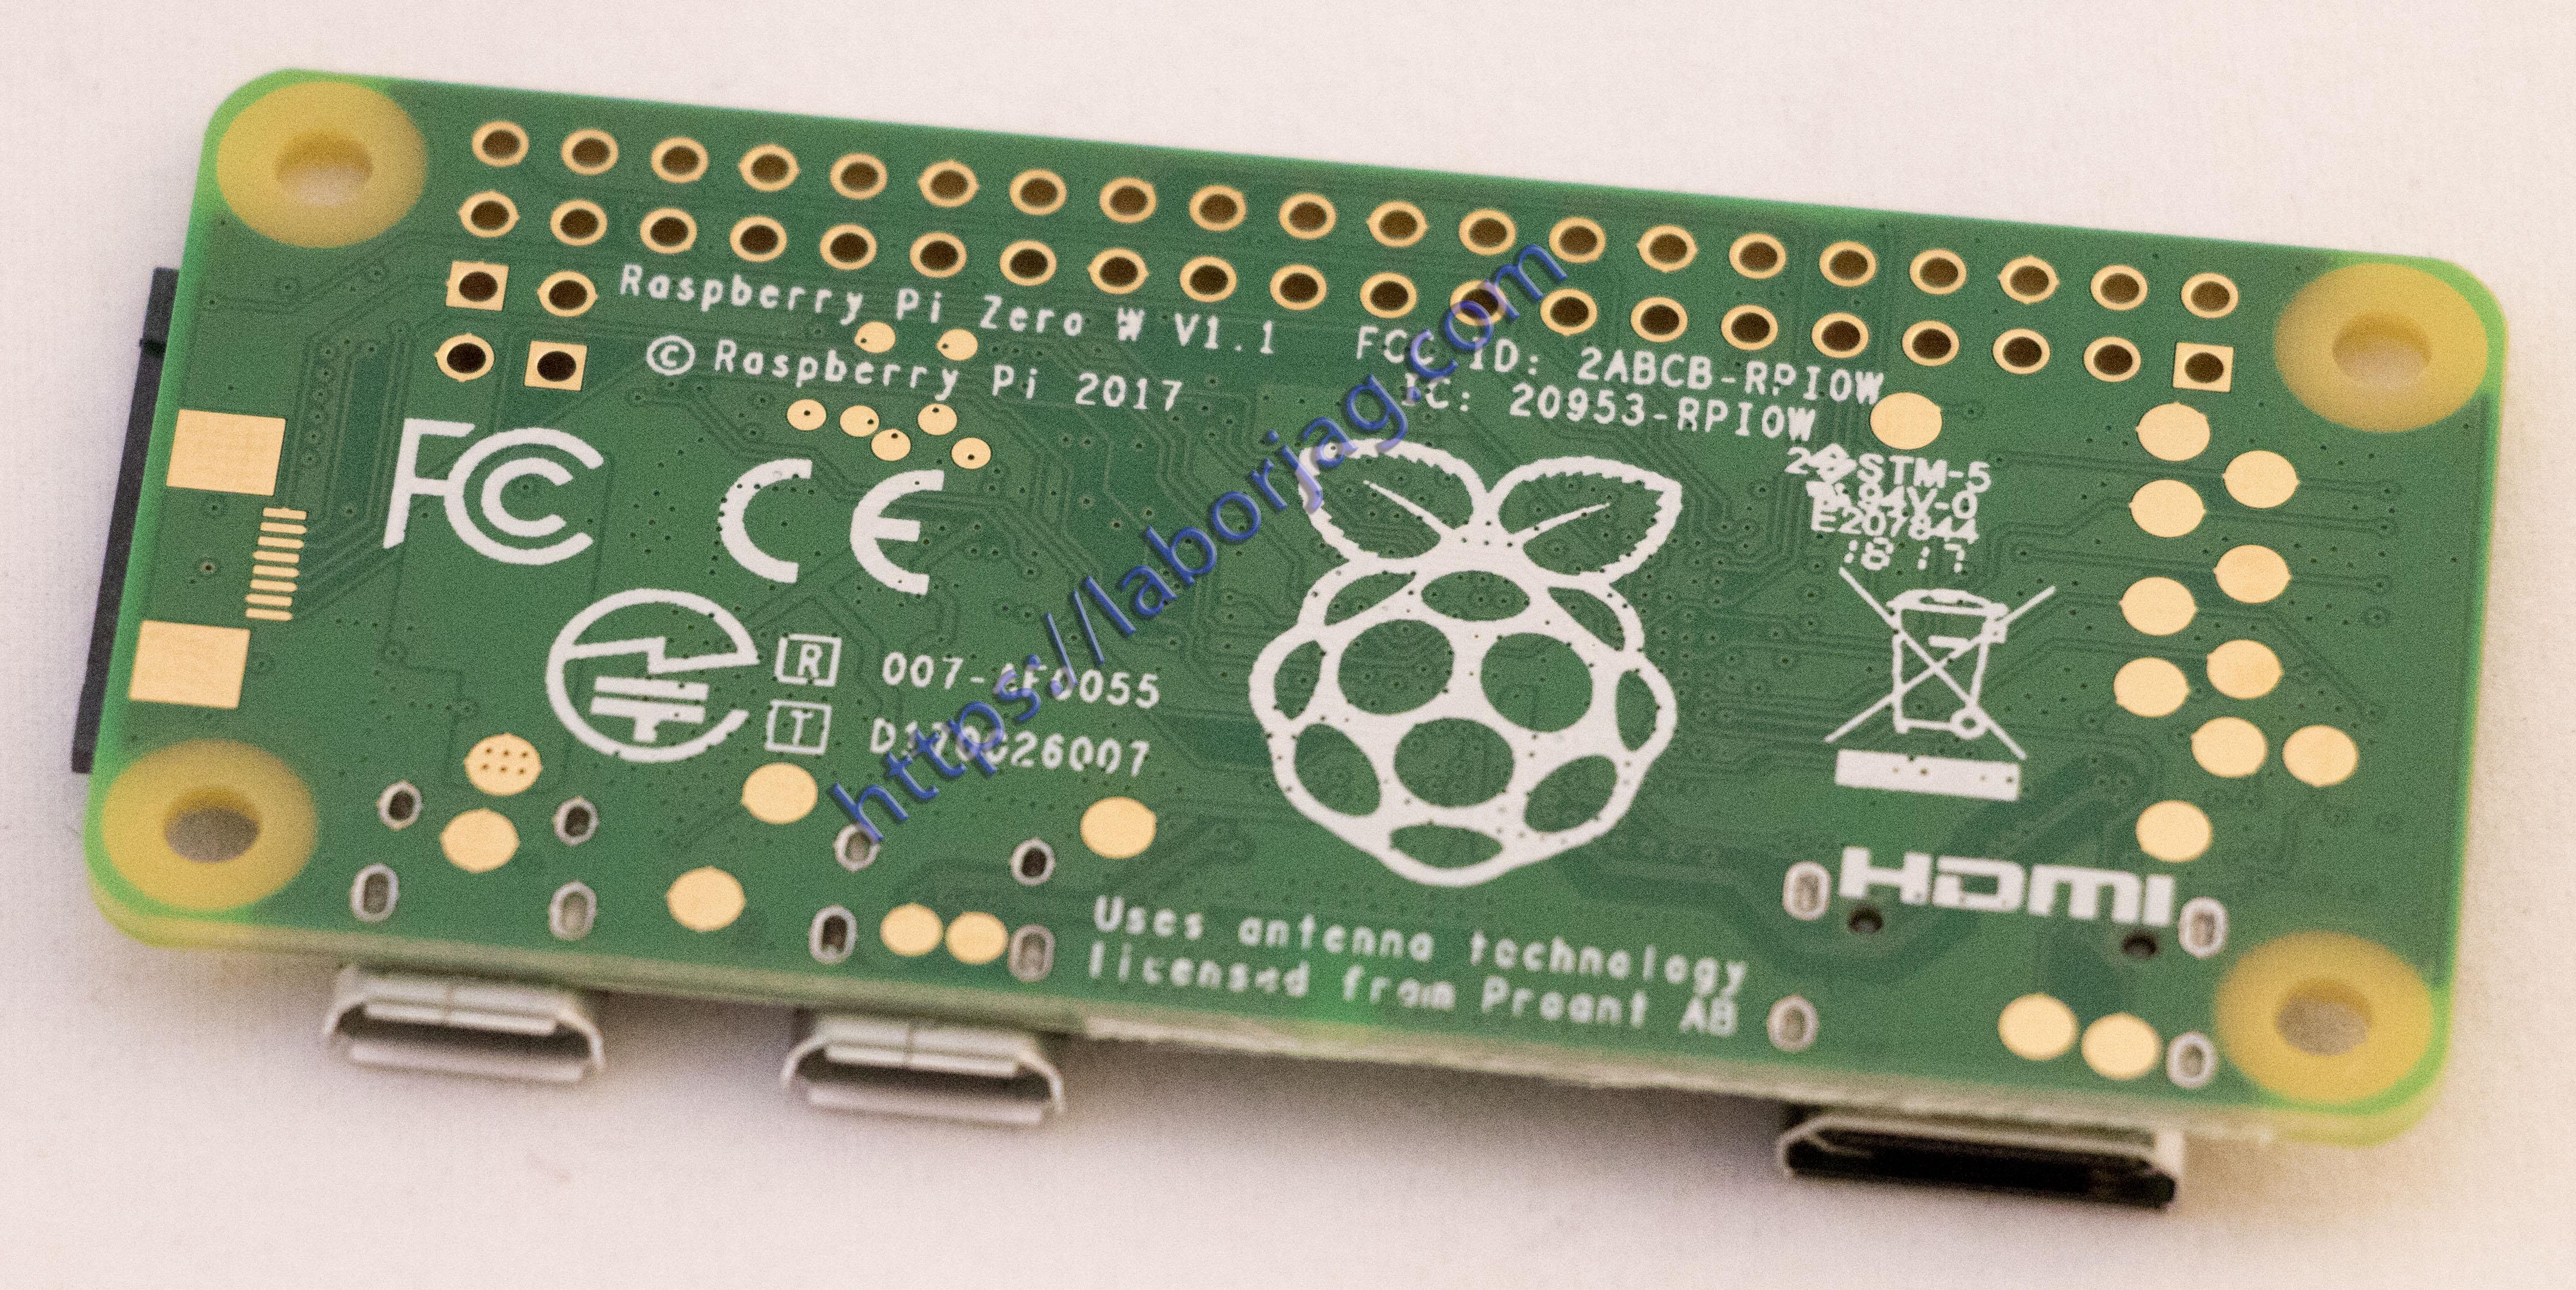 Raspberry Pi Zero Board Wireless and Bluetooth 4 1 Version